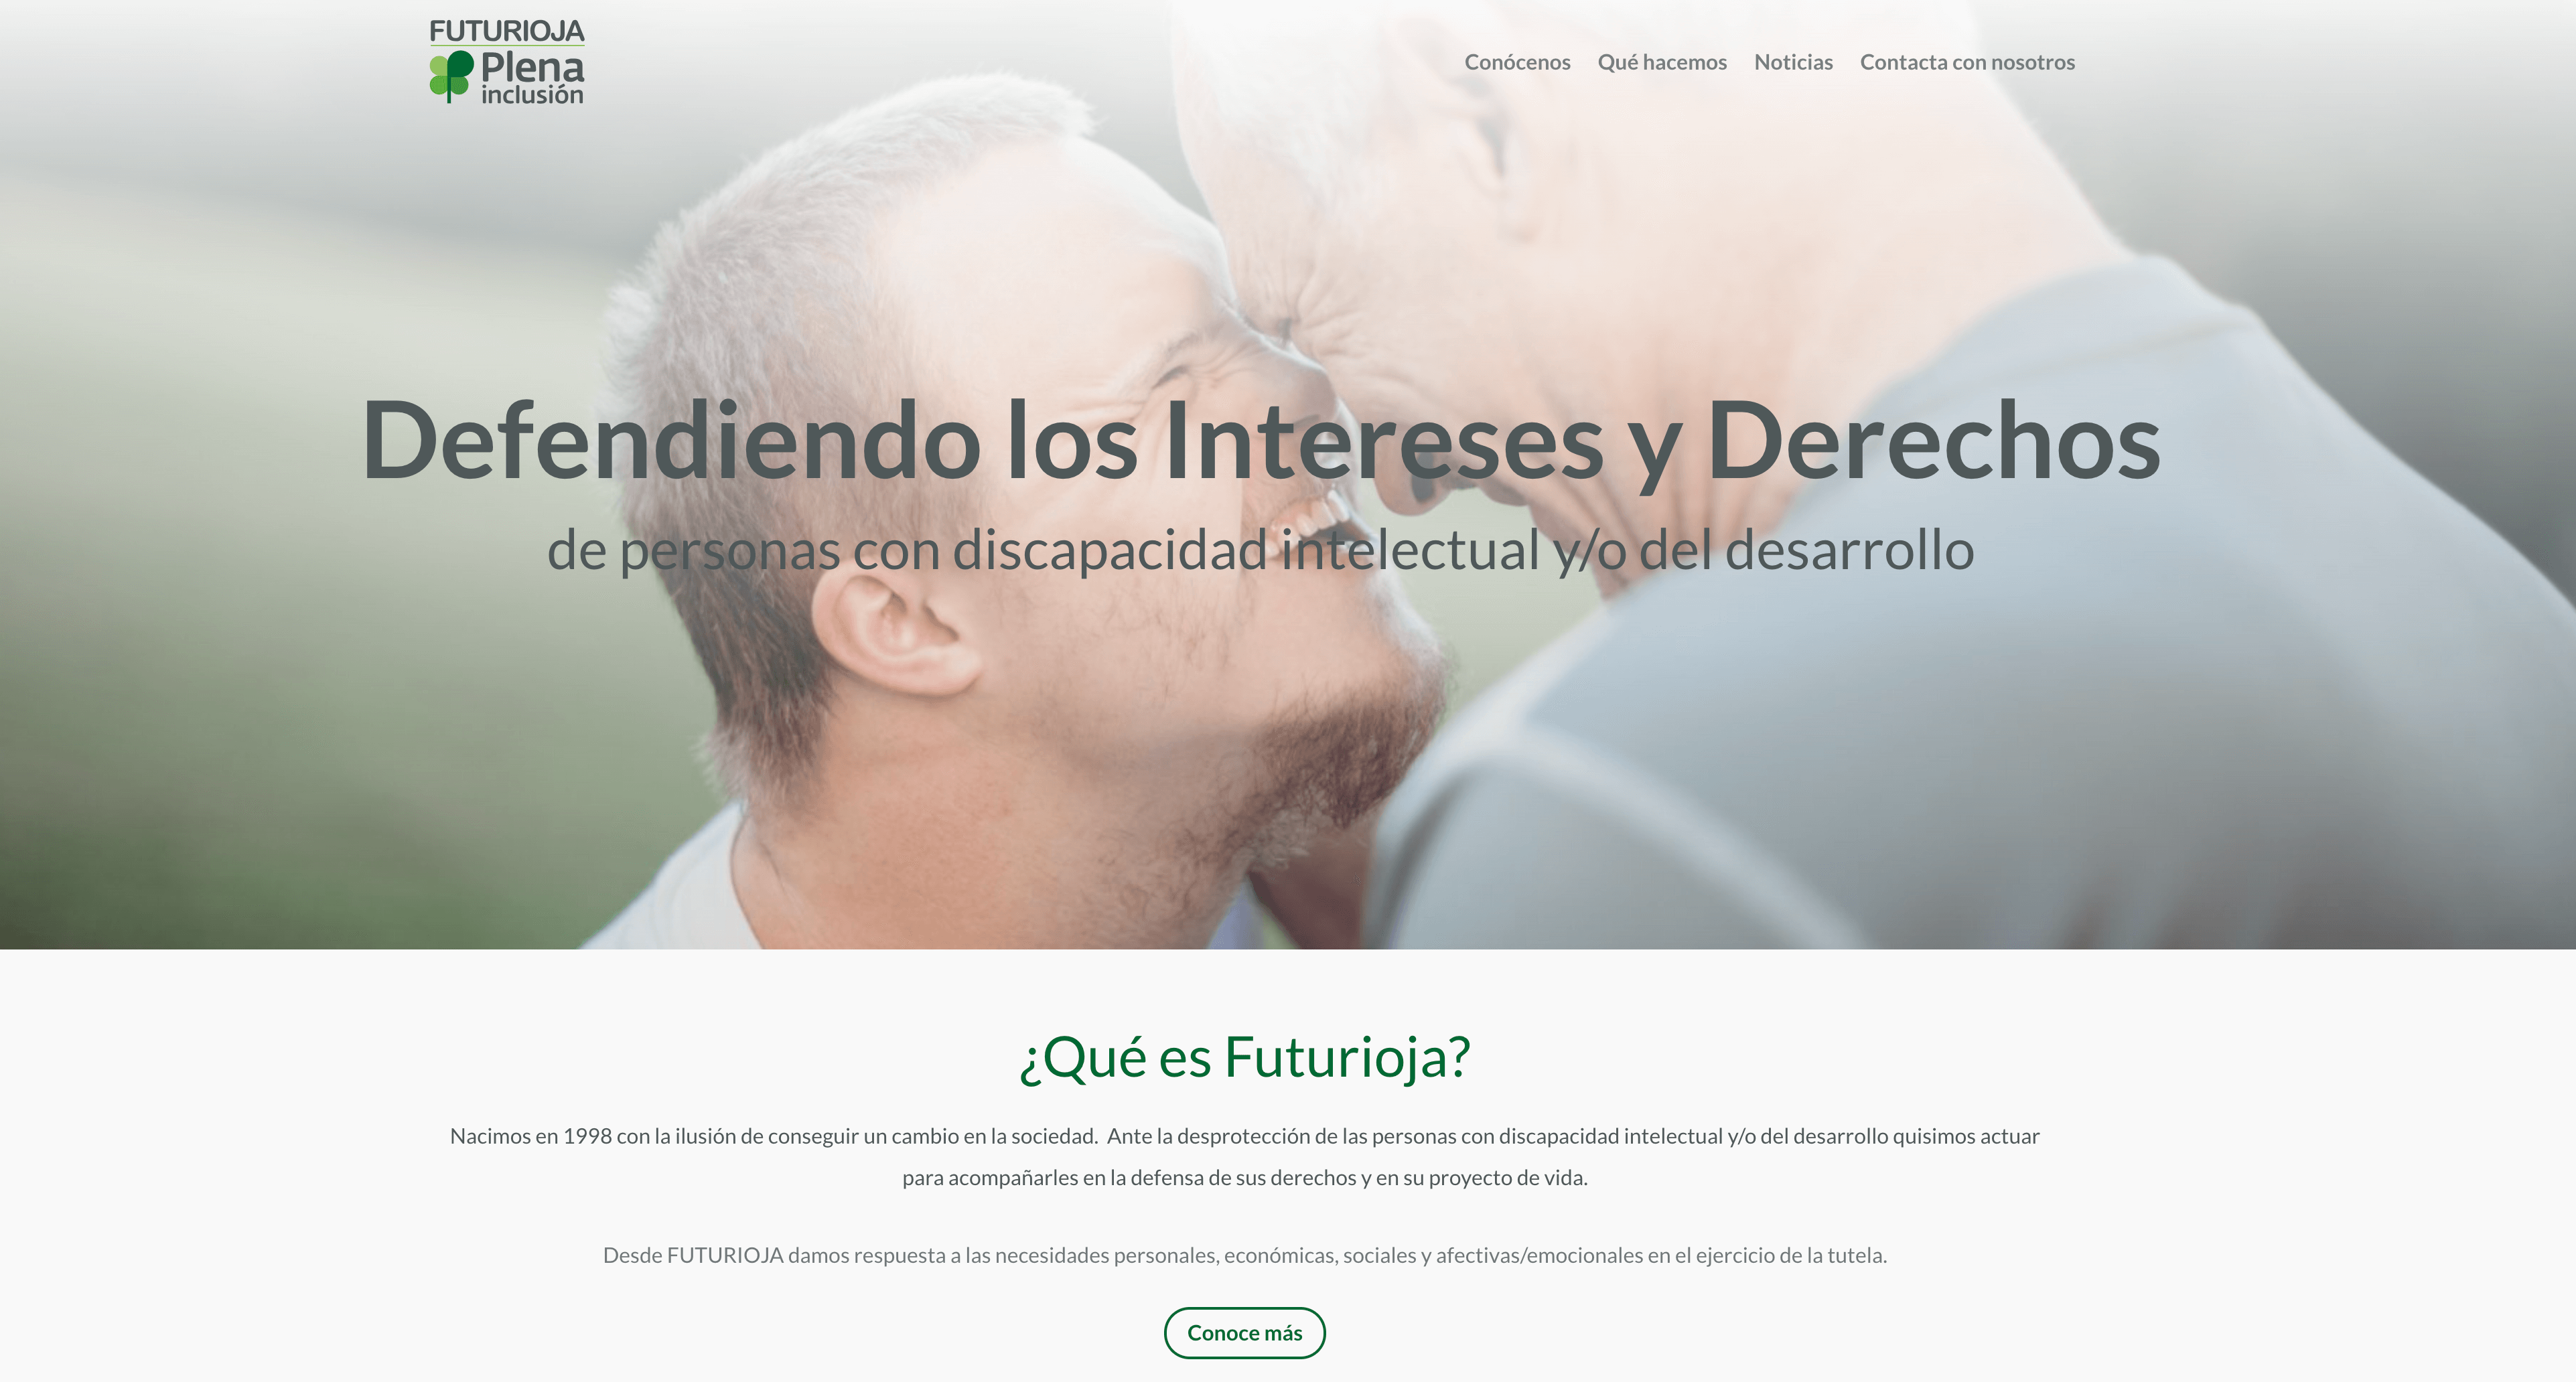 SDi dona a Futurioja una página web 1